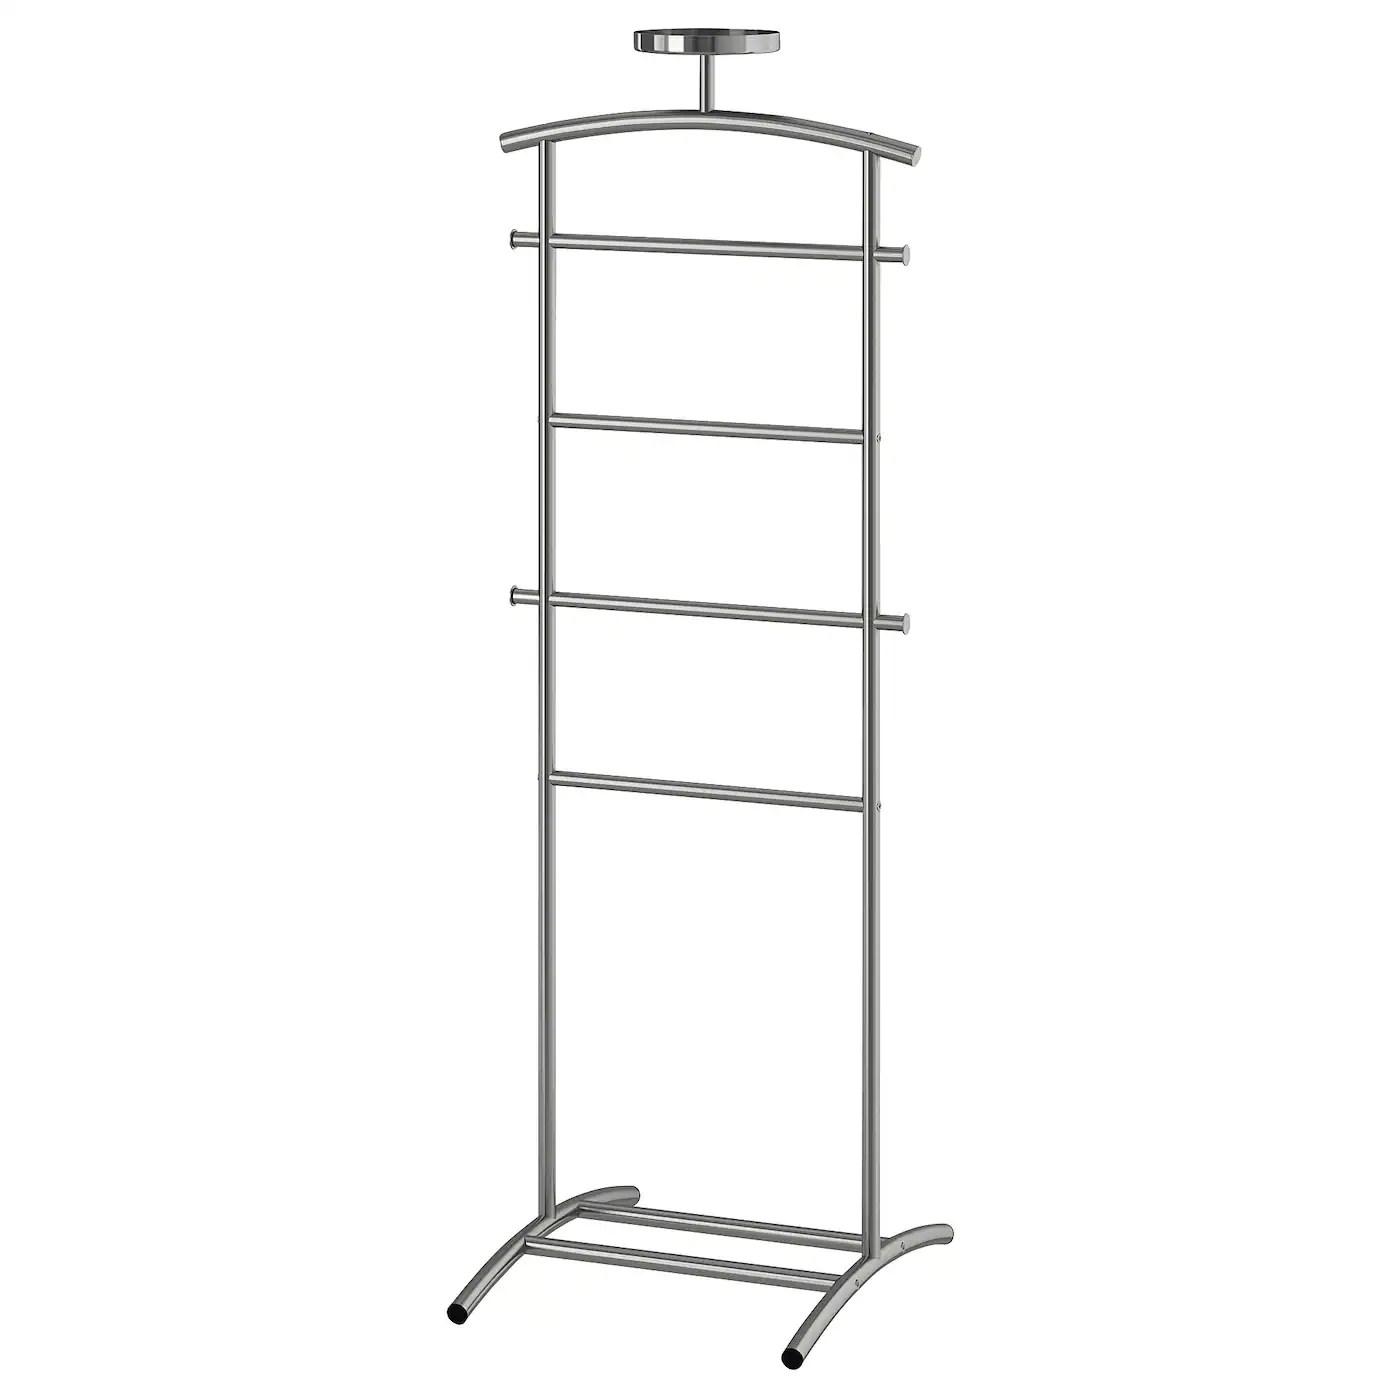 Grundtal Valet Stand Stainless Steel 128 Cm Ikea Switzerland